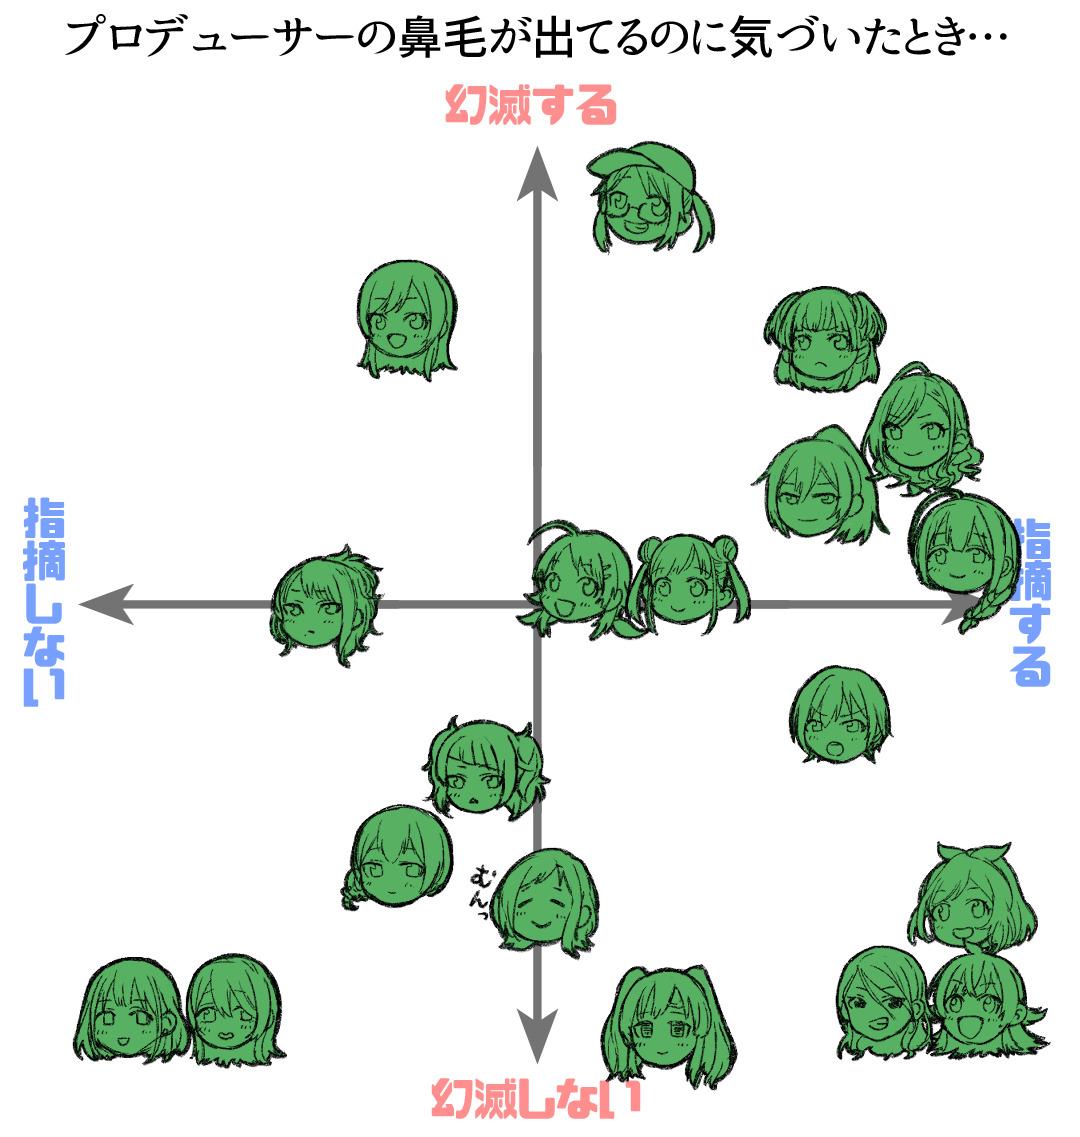 f:id:hoshi_sano:20200414110624j:image:w400